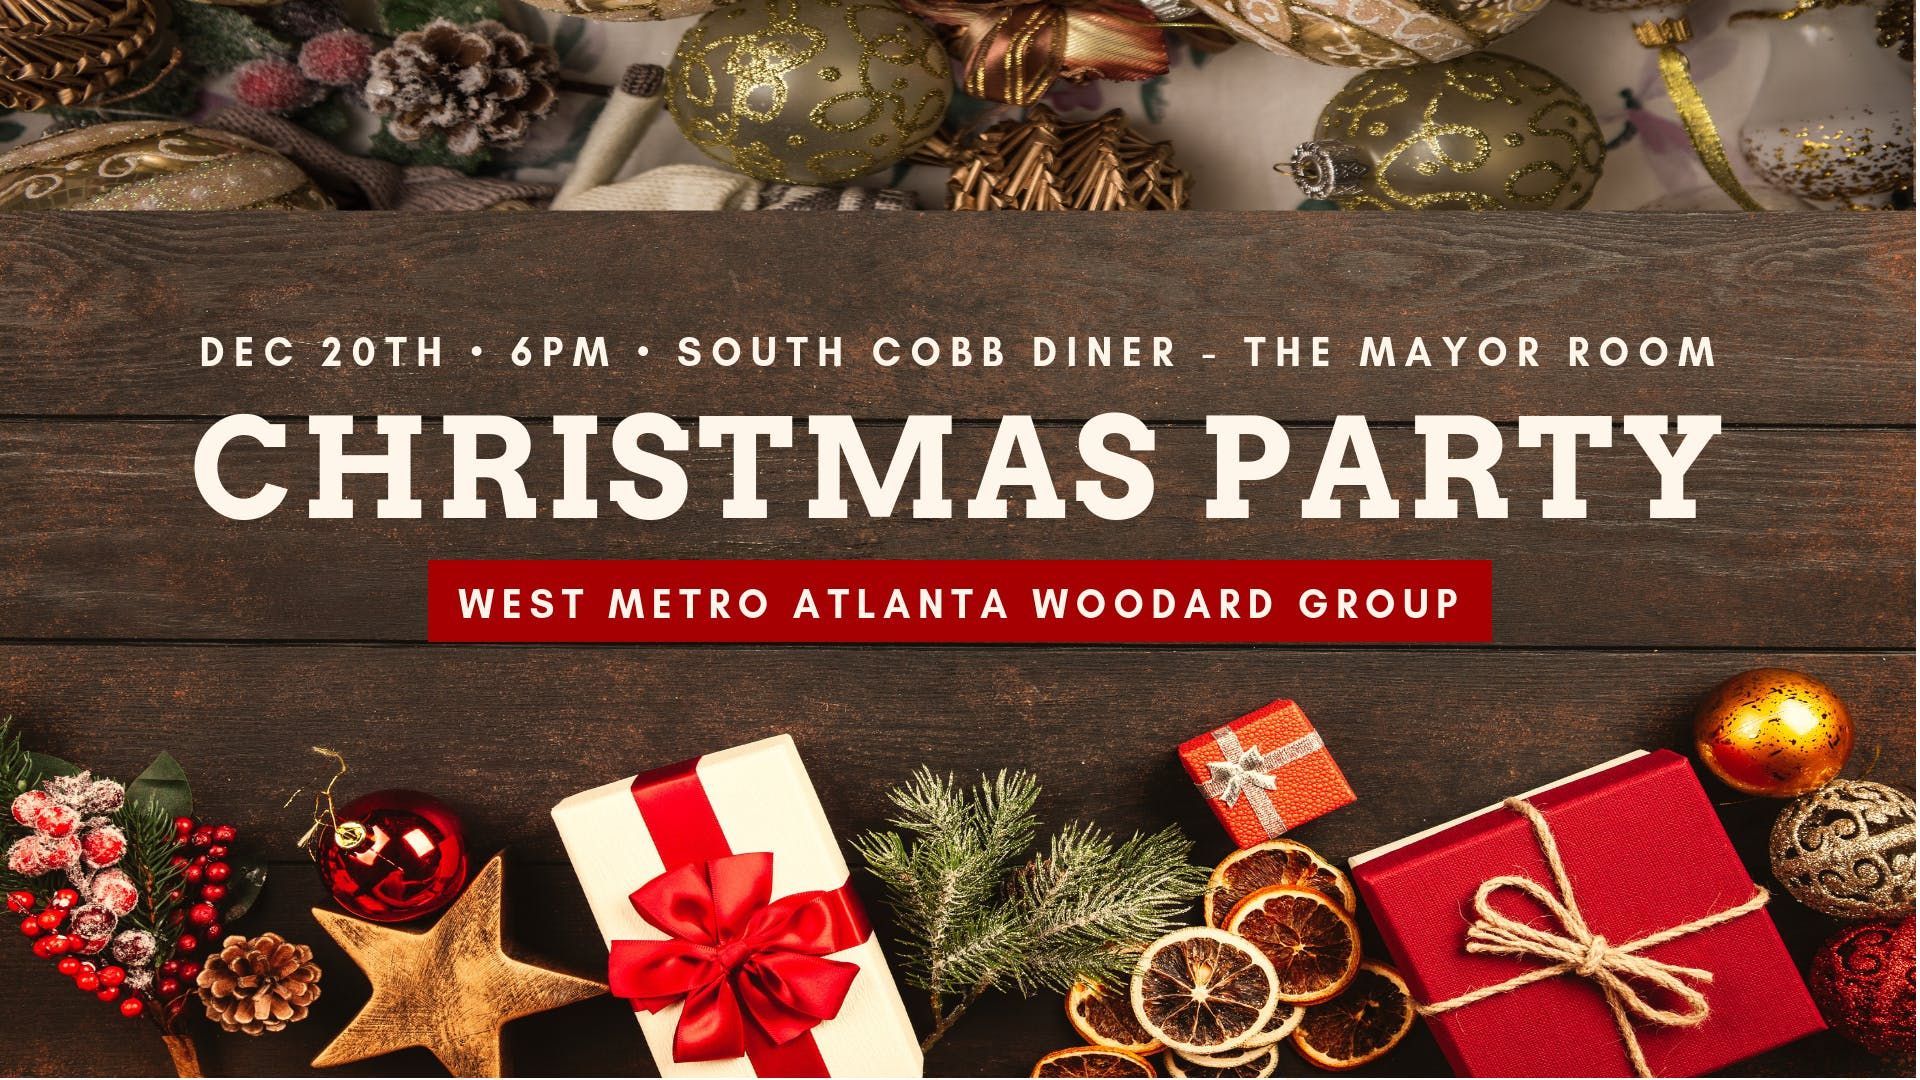 West Metro Atlanta Woodard Group Christmas Party - 24 JAN 2019